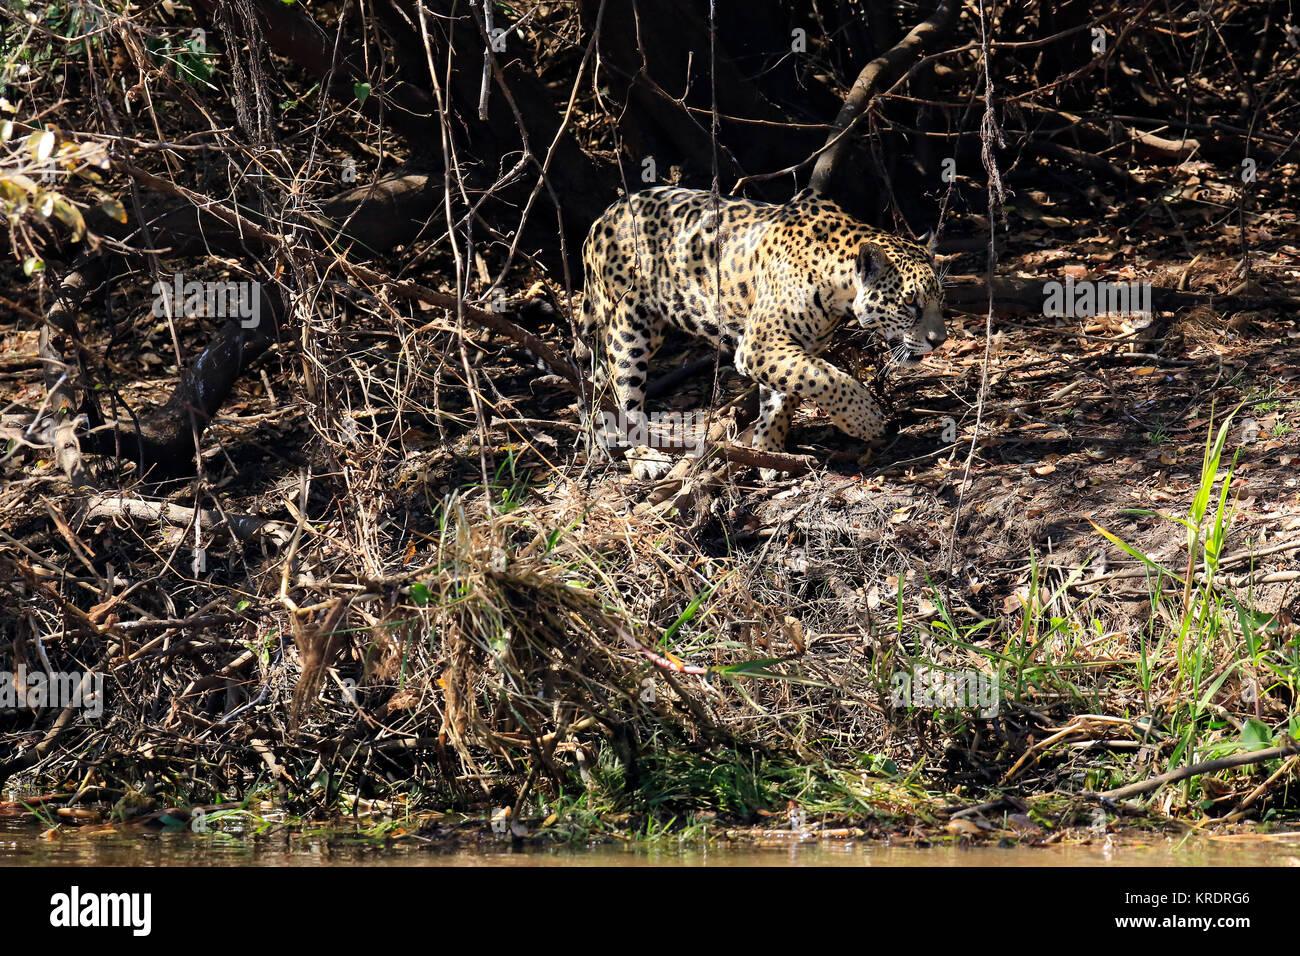 Jaguar Walking along the River Bank, Pantanal, Brazil - Stock Image